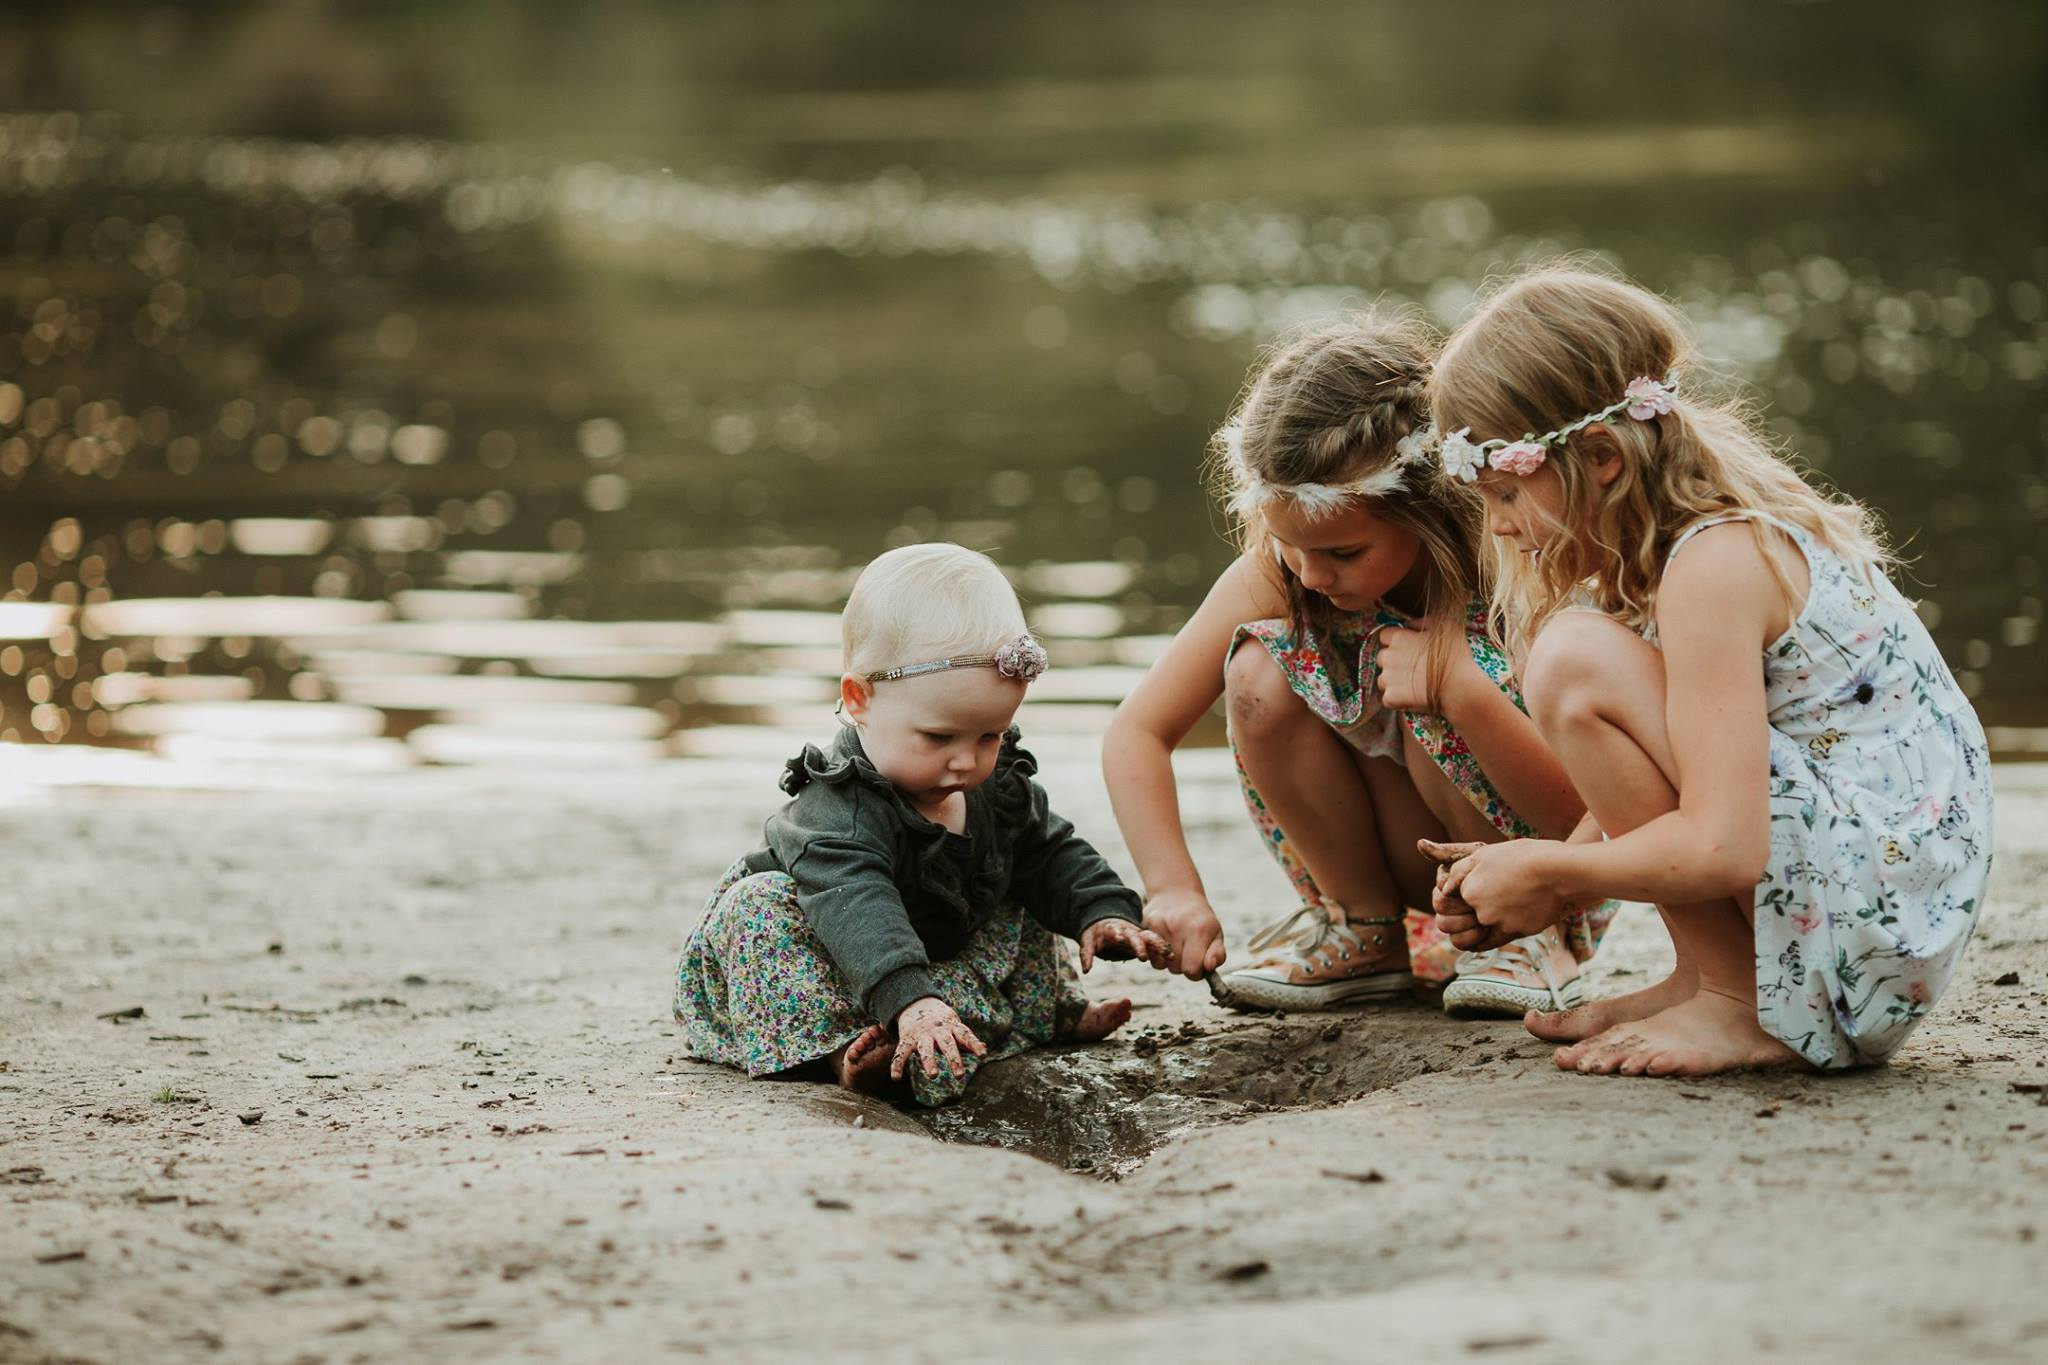 Families & Motherhood - collections